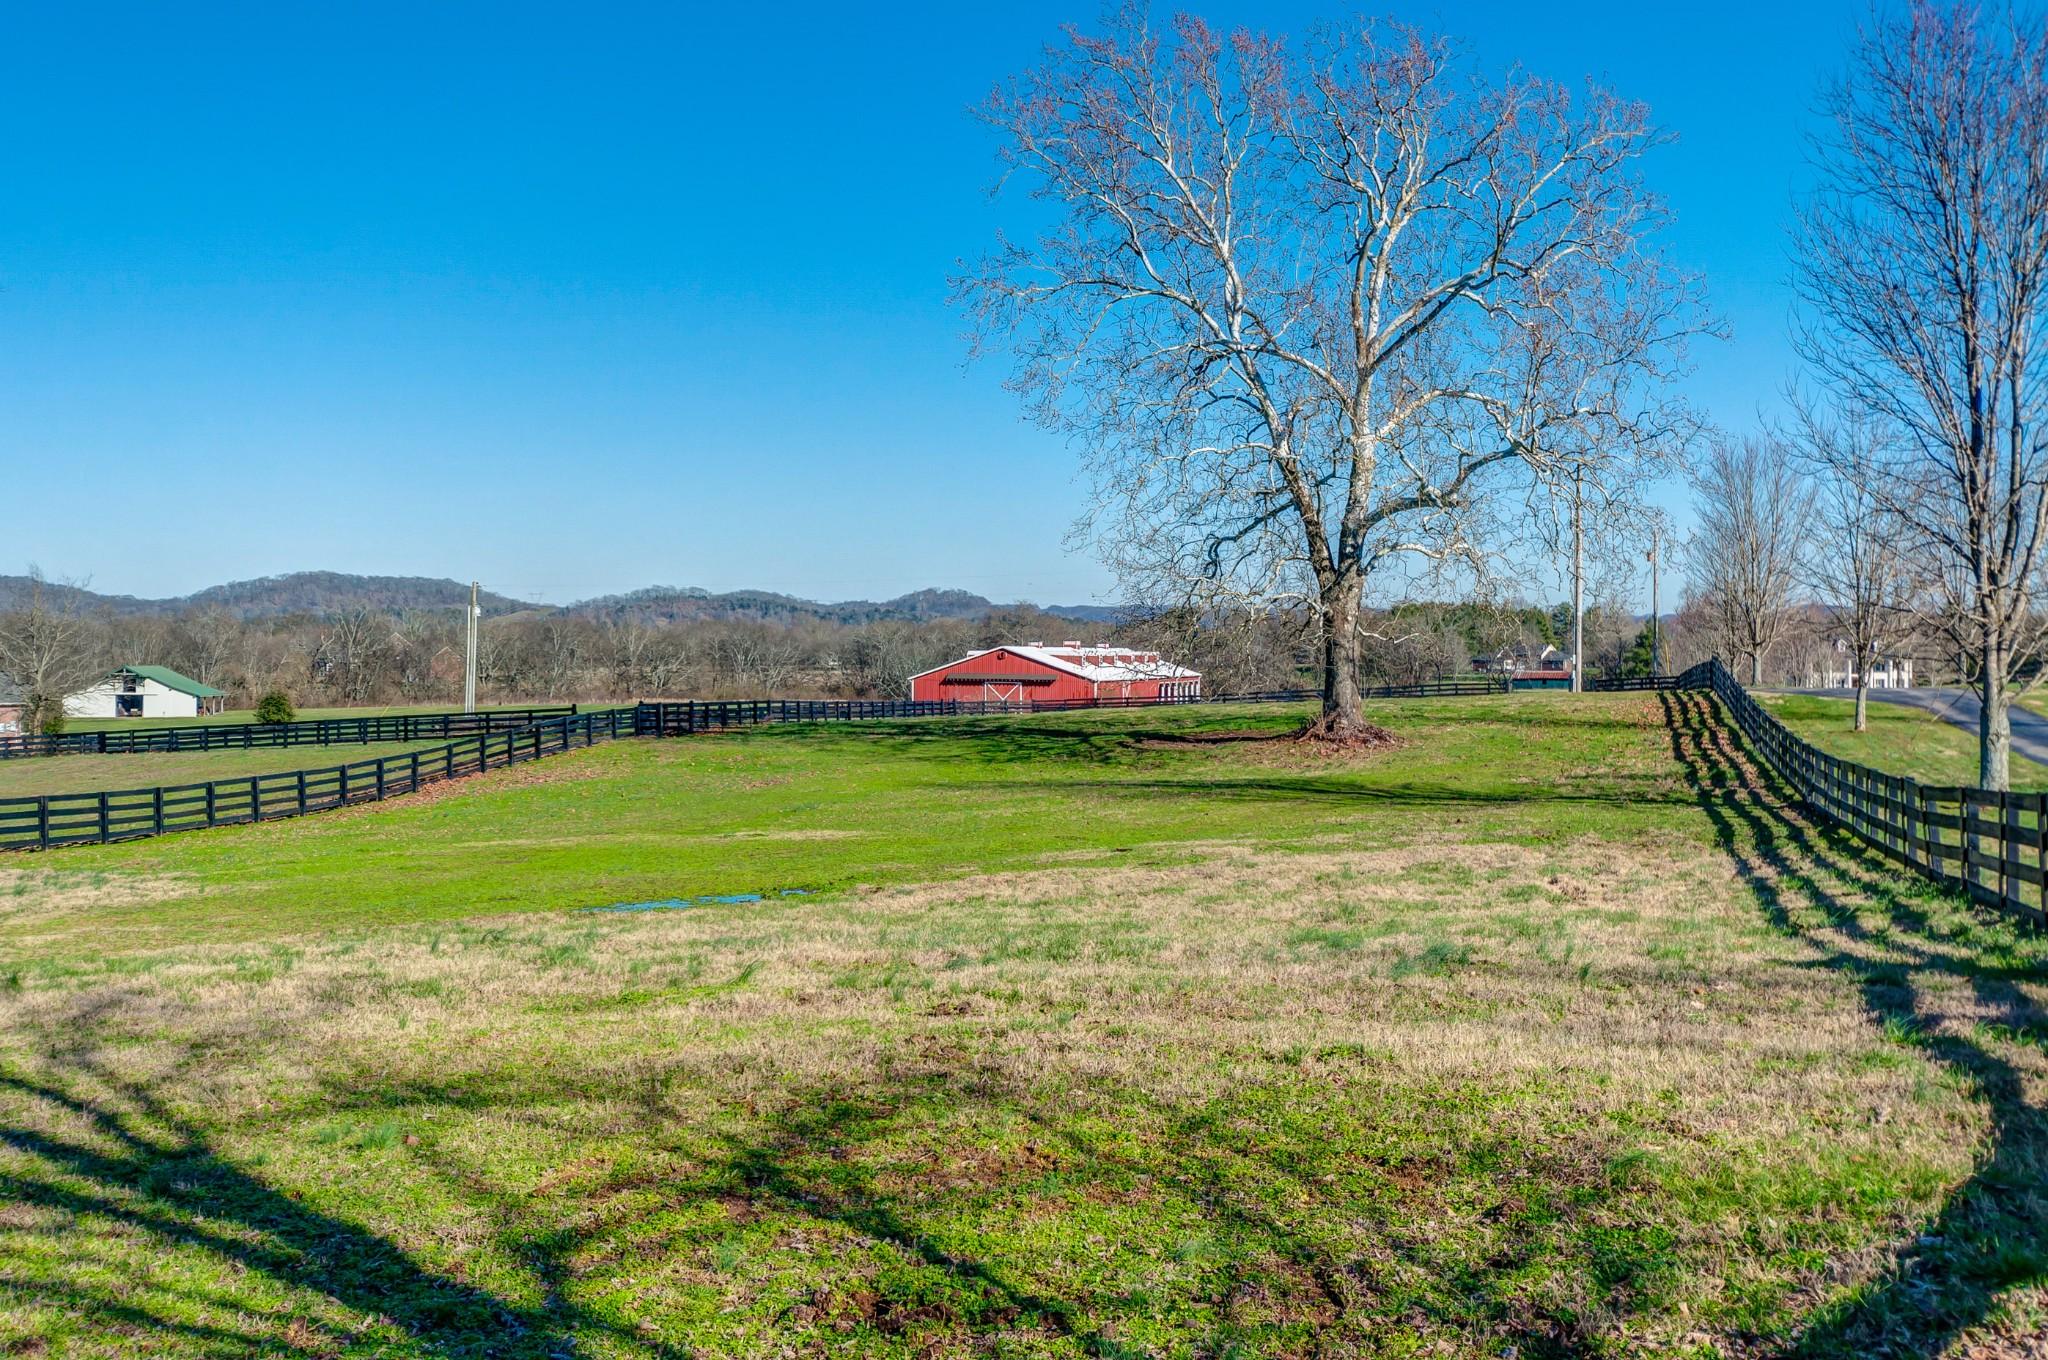 1864 Old Natchez Trace, Franklin, TN 37069 - Franklin, TN real estate listing